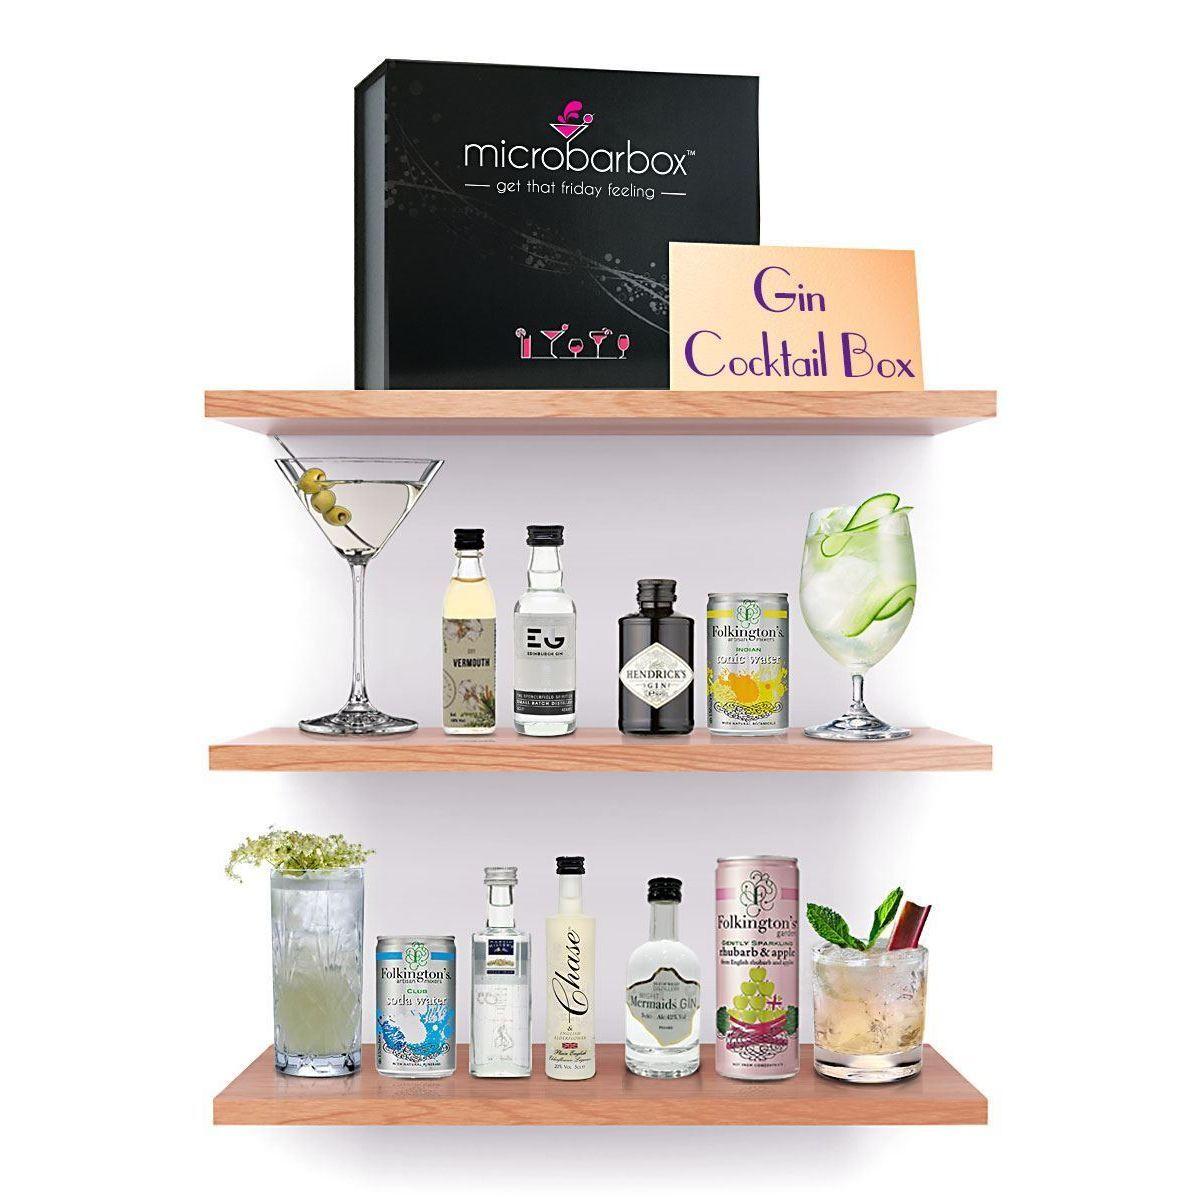 MicroBarBox Gin Cocktail Box